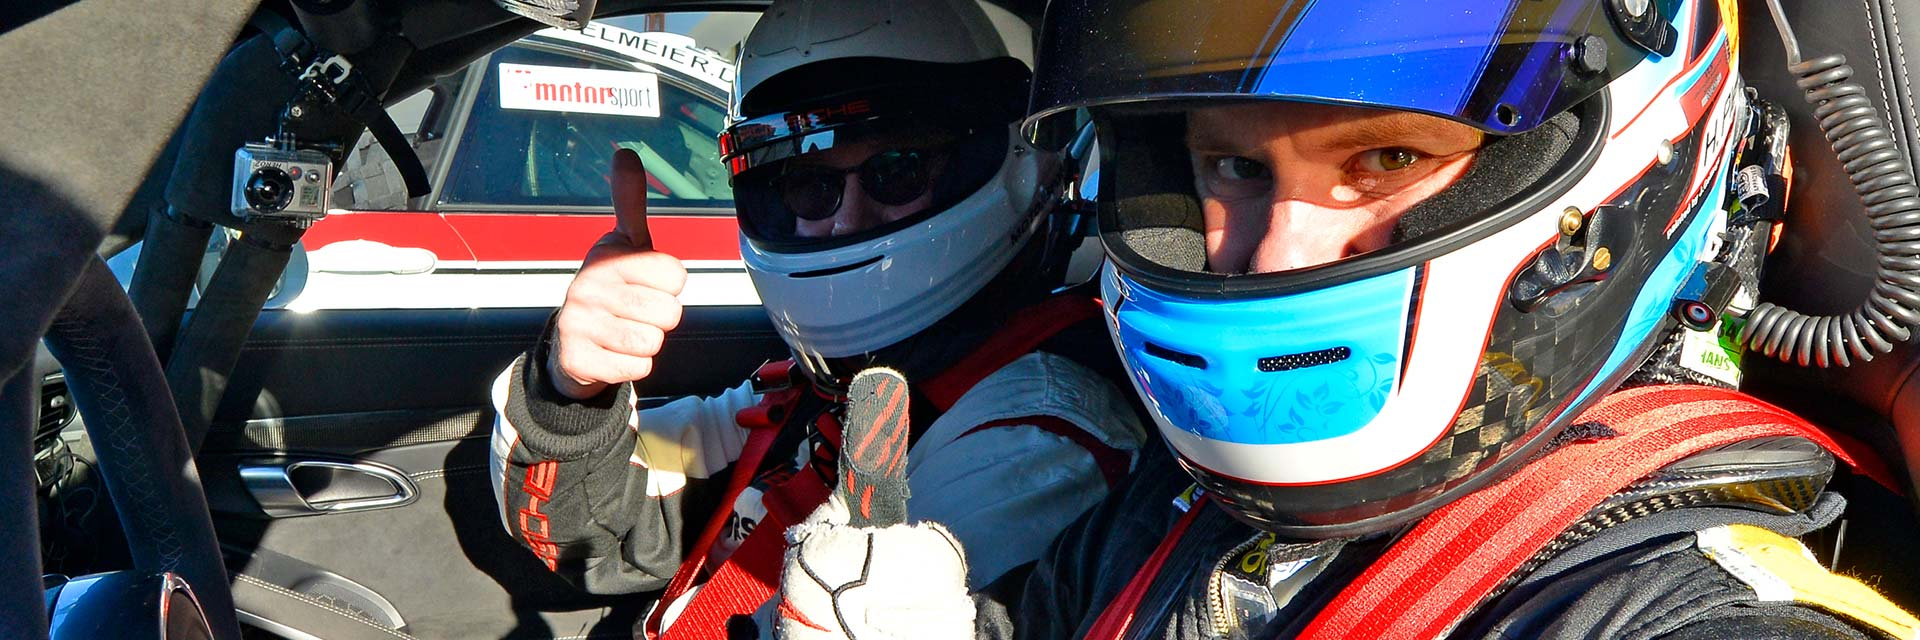 GEDLICH Racing - Endless Summer 1:1 Coaching